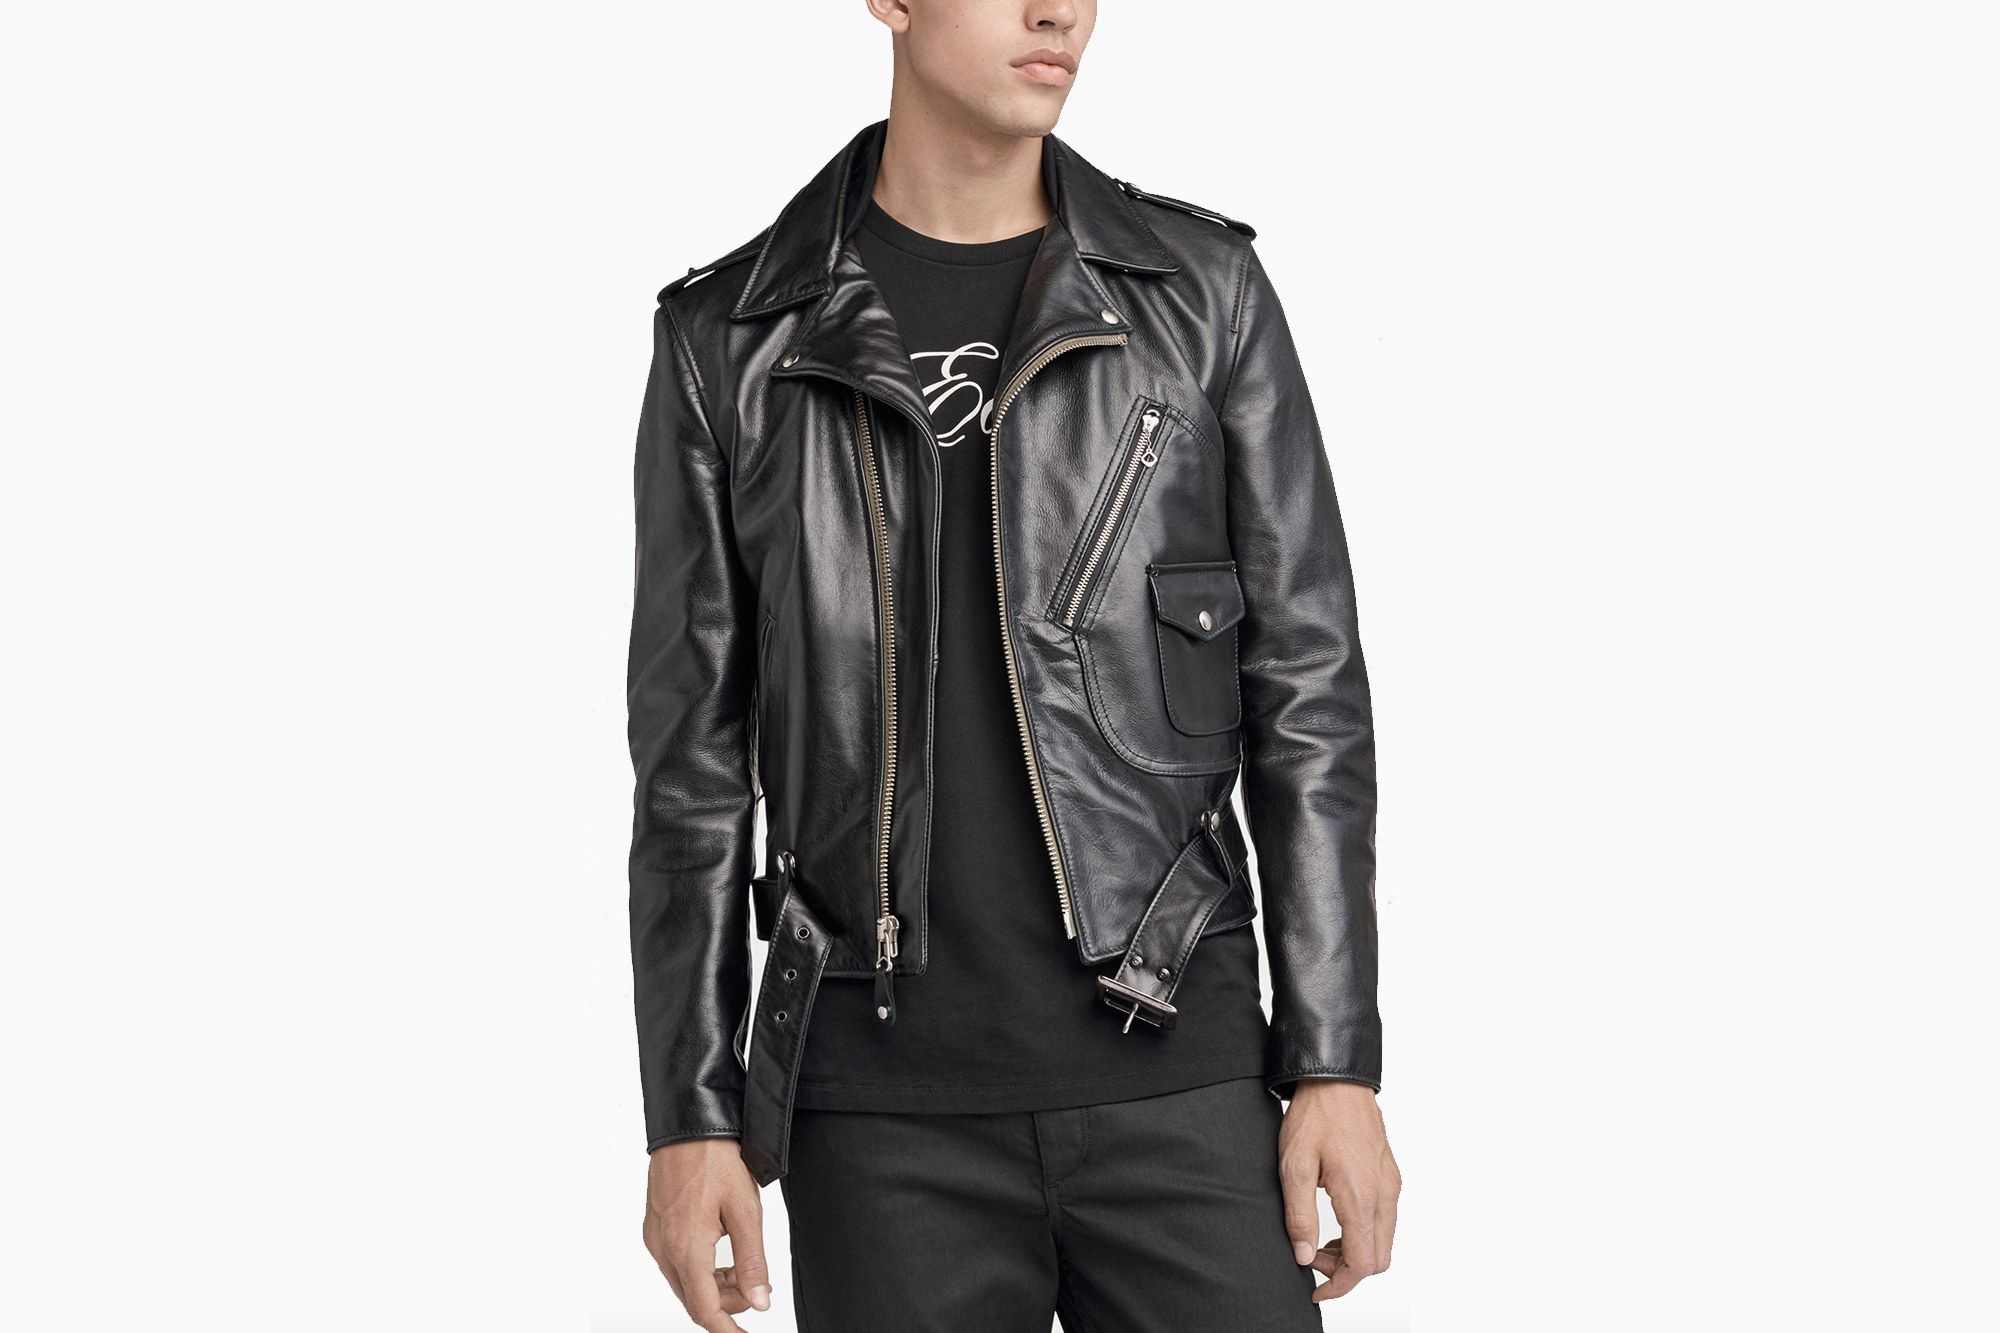 The Best Leather Biker Jackets Will Rev Up Your Spring Wardrobe Leather Jacket Men Black Leather Motorcycle Jacket Black Leather Biker Jacket [ 1333 x 2000 Pixel ]